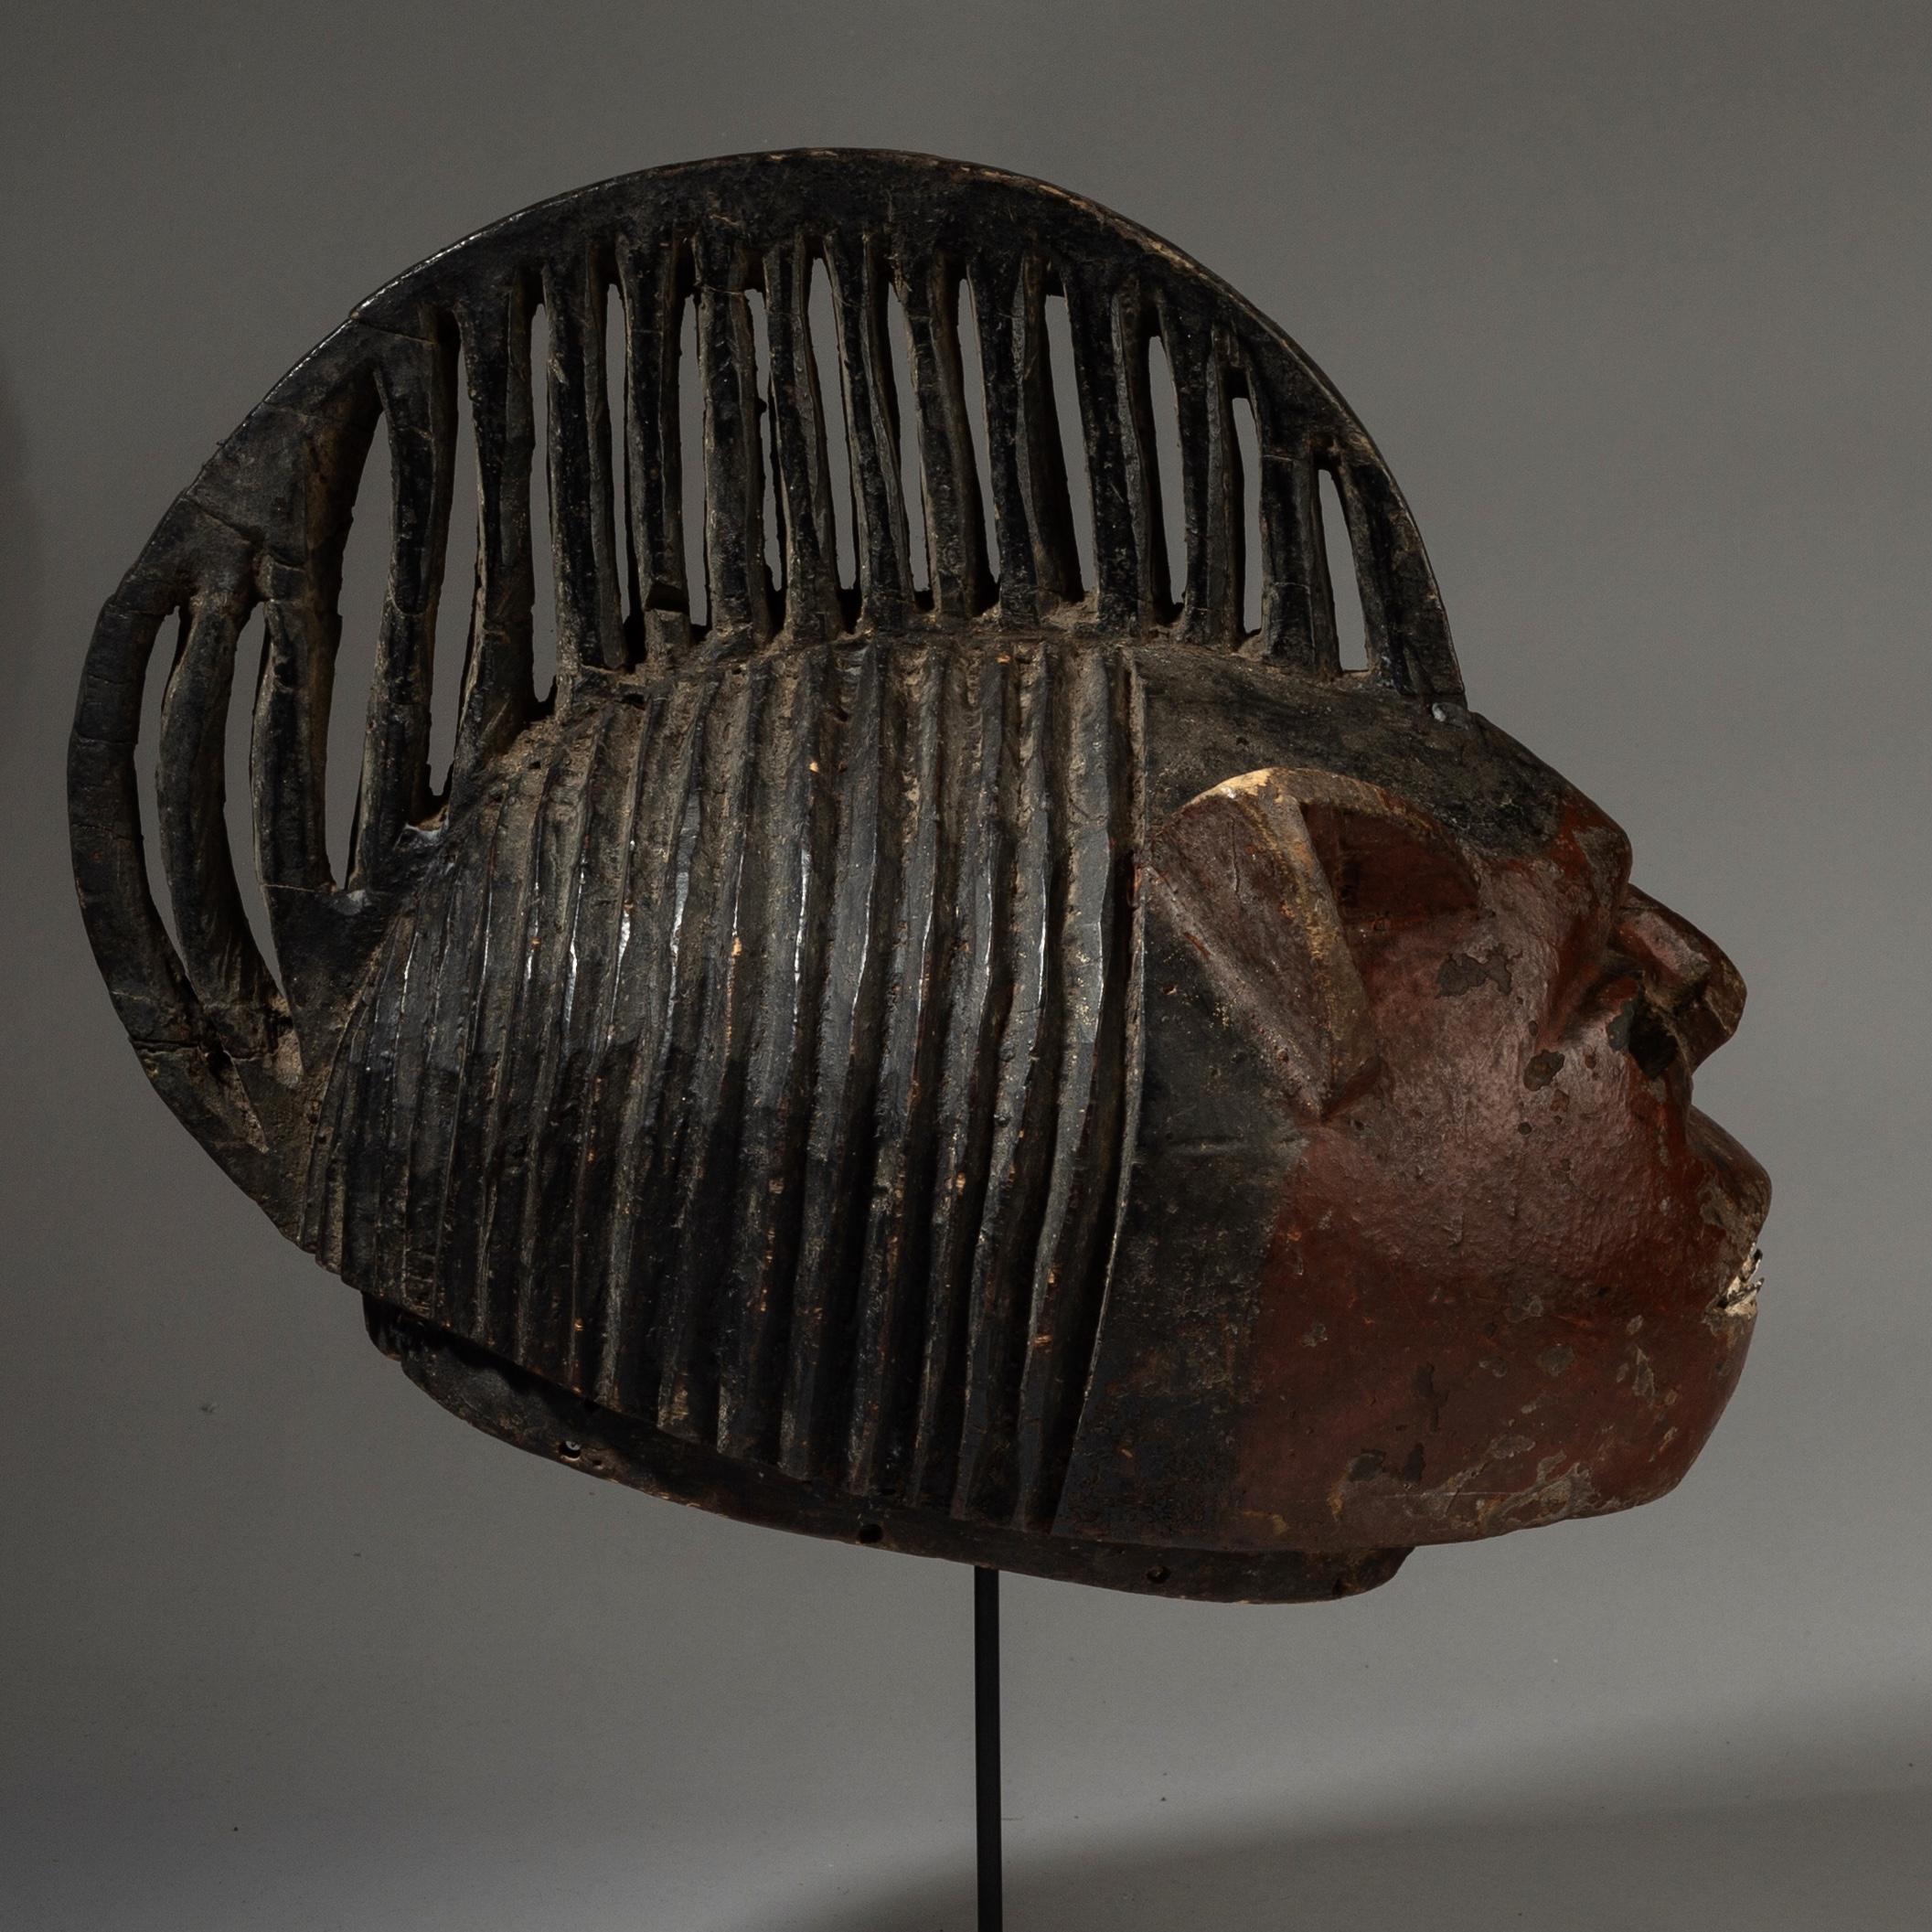 SD A LARGE HEADDRESS WITH METAL TEETH, NIGERIA, W. AFRICA  ( No 3116 )